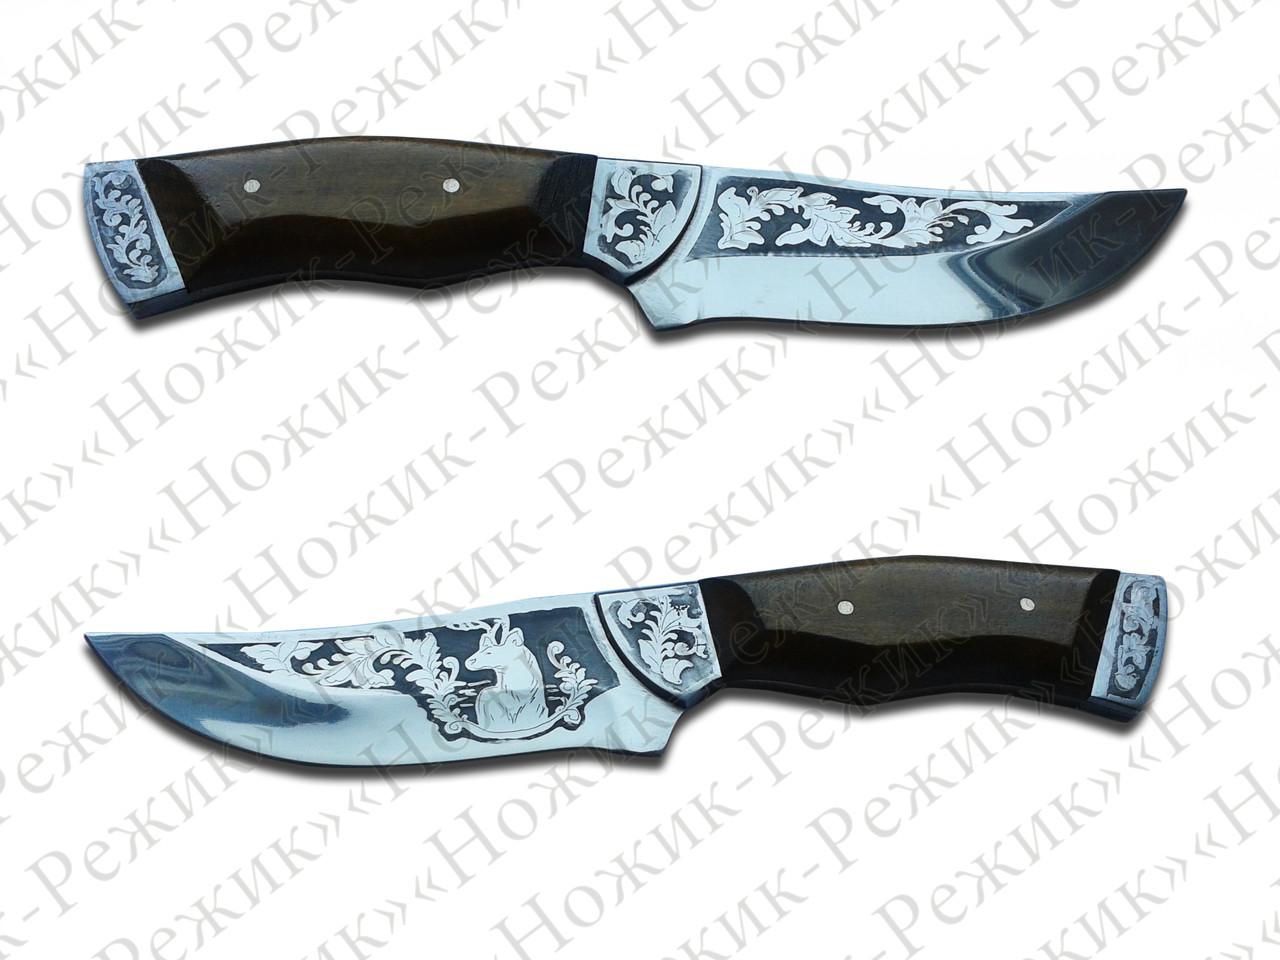 Нож туристический, нож охотничий, нож рыбацкий, нож АТО, нож для кемпинга